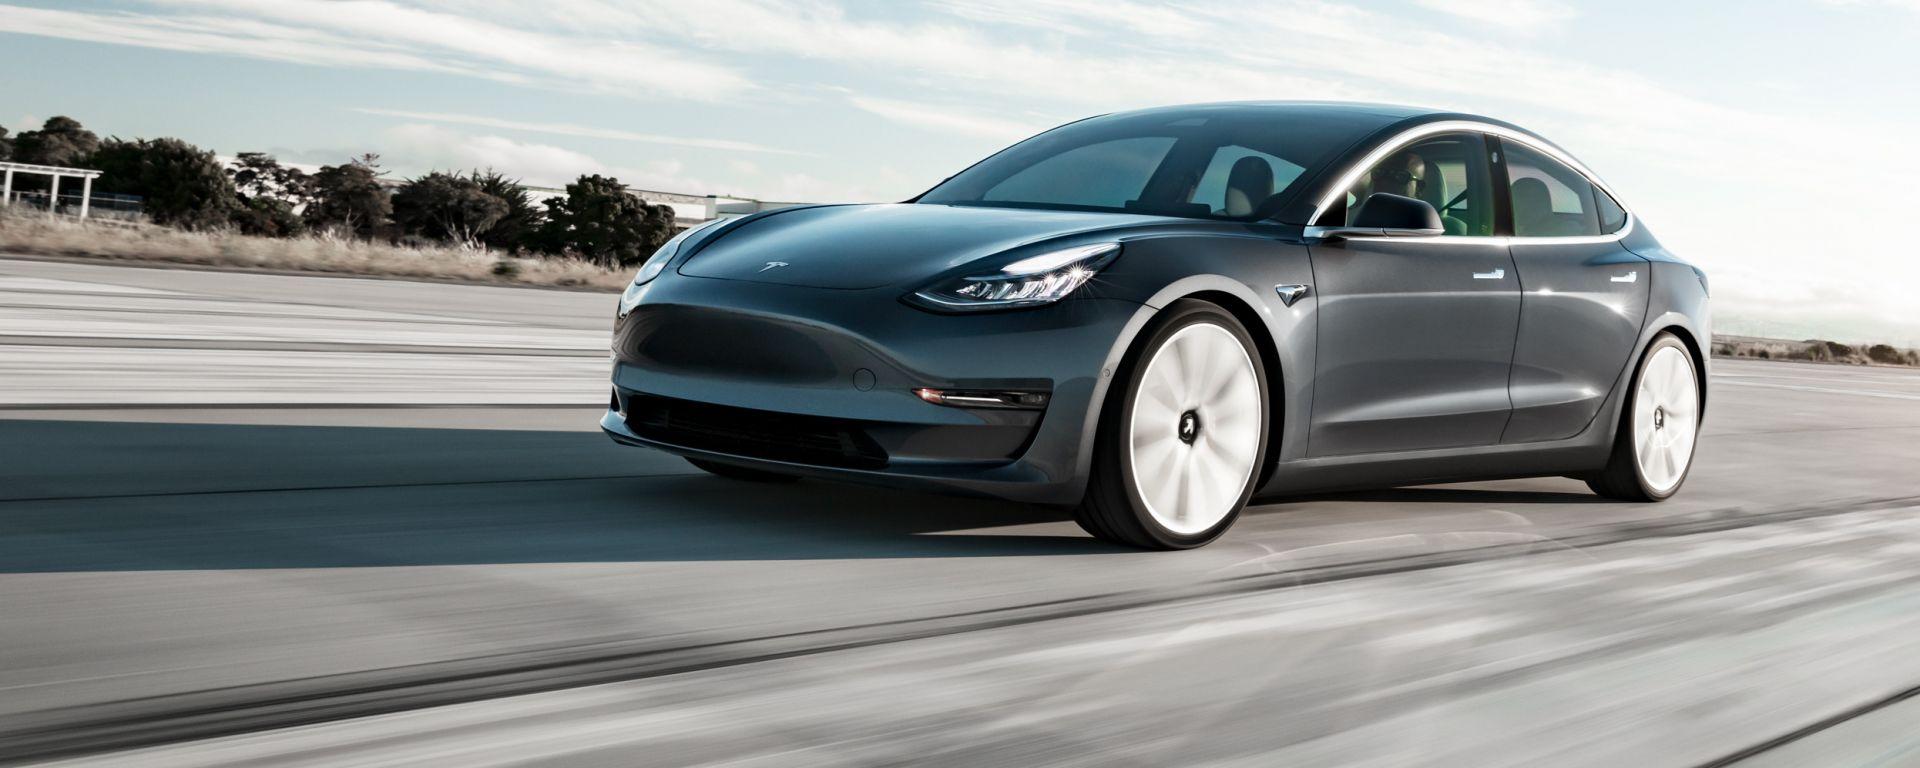 Ingenext sblocca la funzione acceleration boost di Tesla Model 3